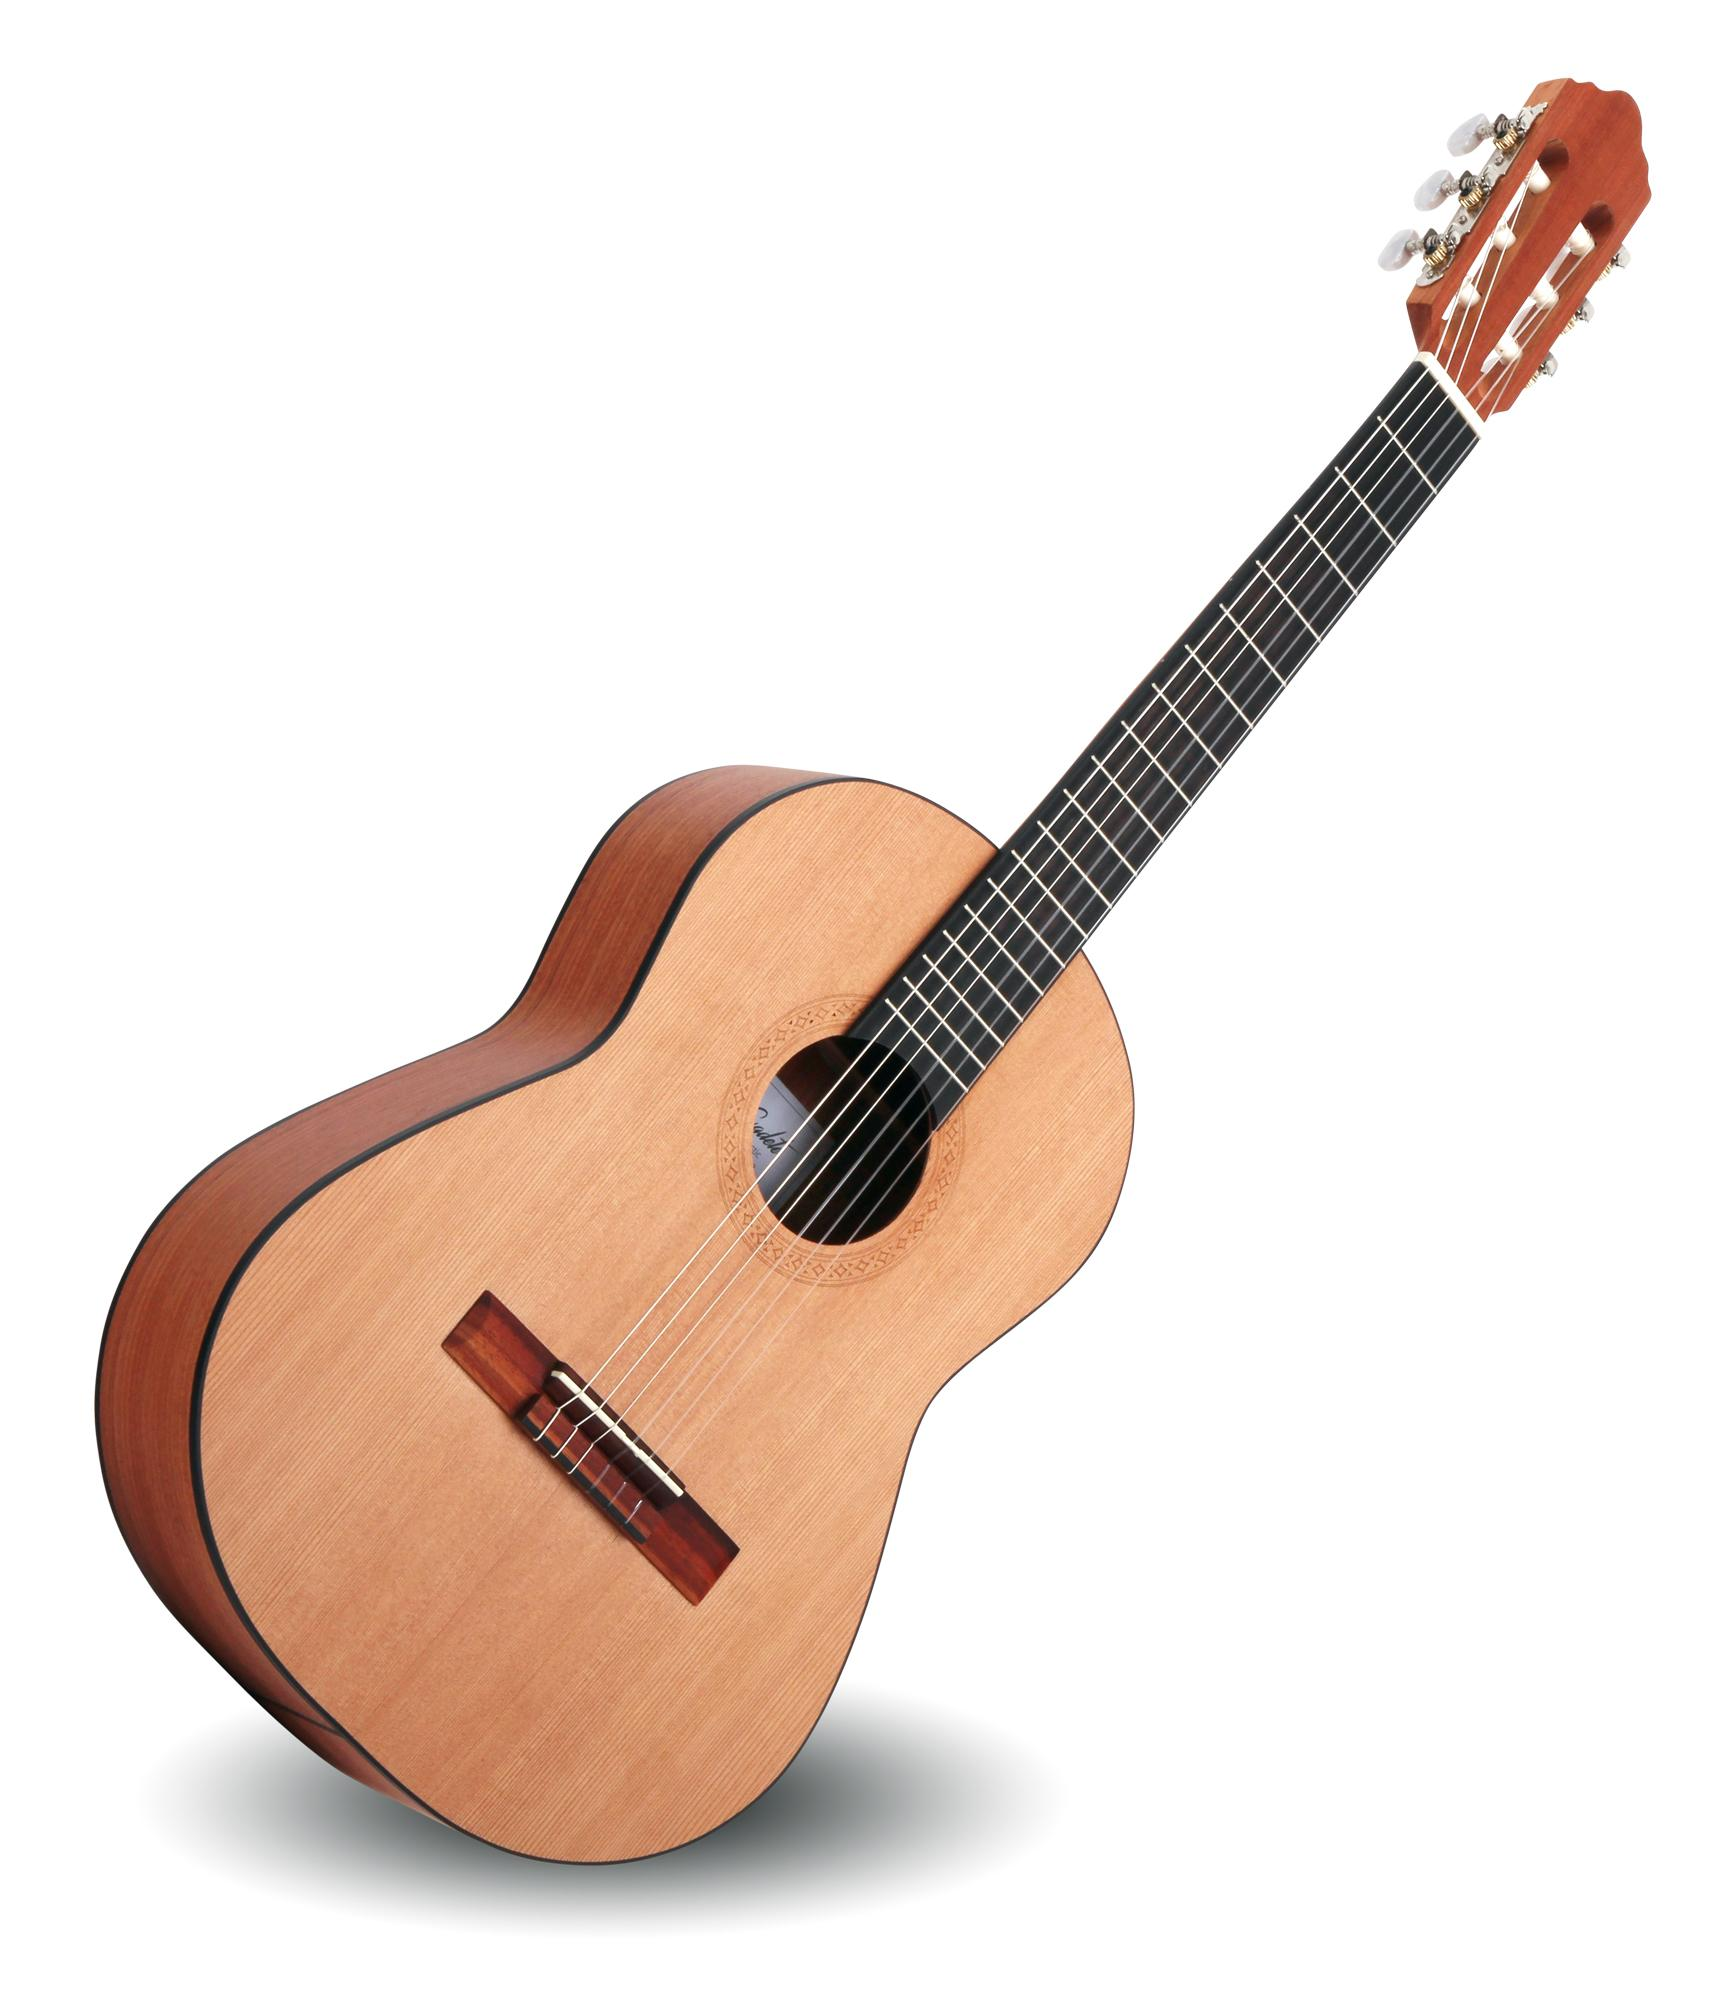 Calida Cadete Konzertgitarre 3|4 Zeder Matt Made in Portugal